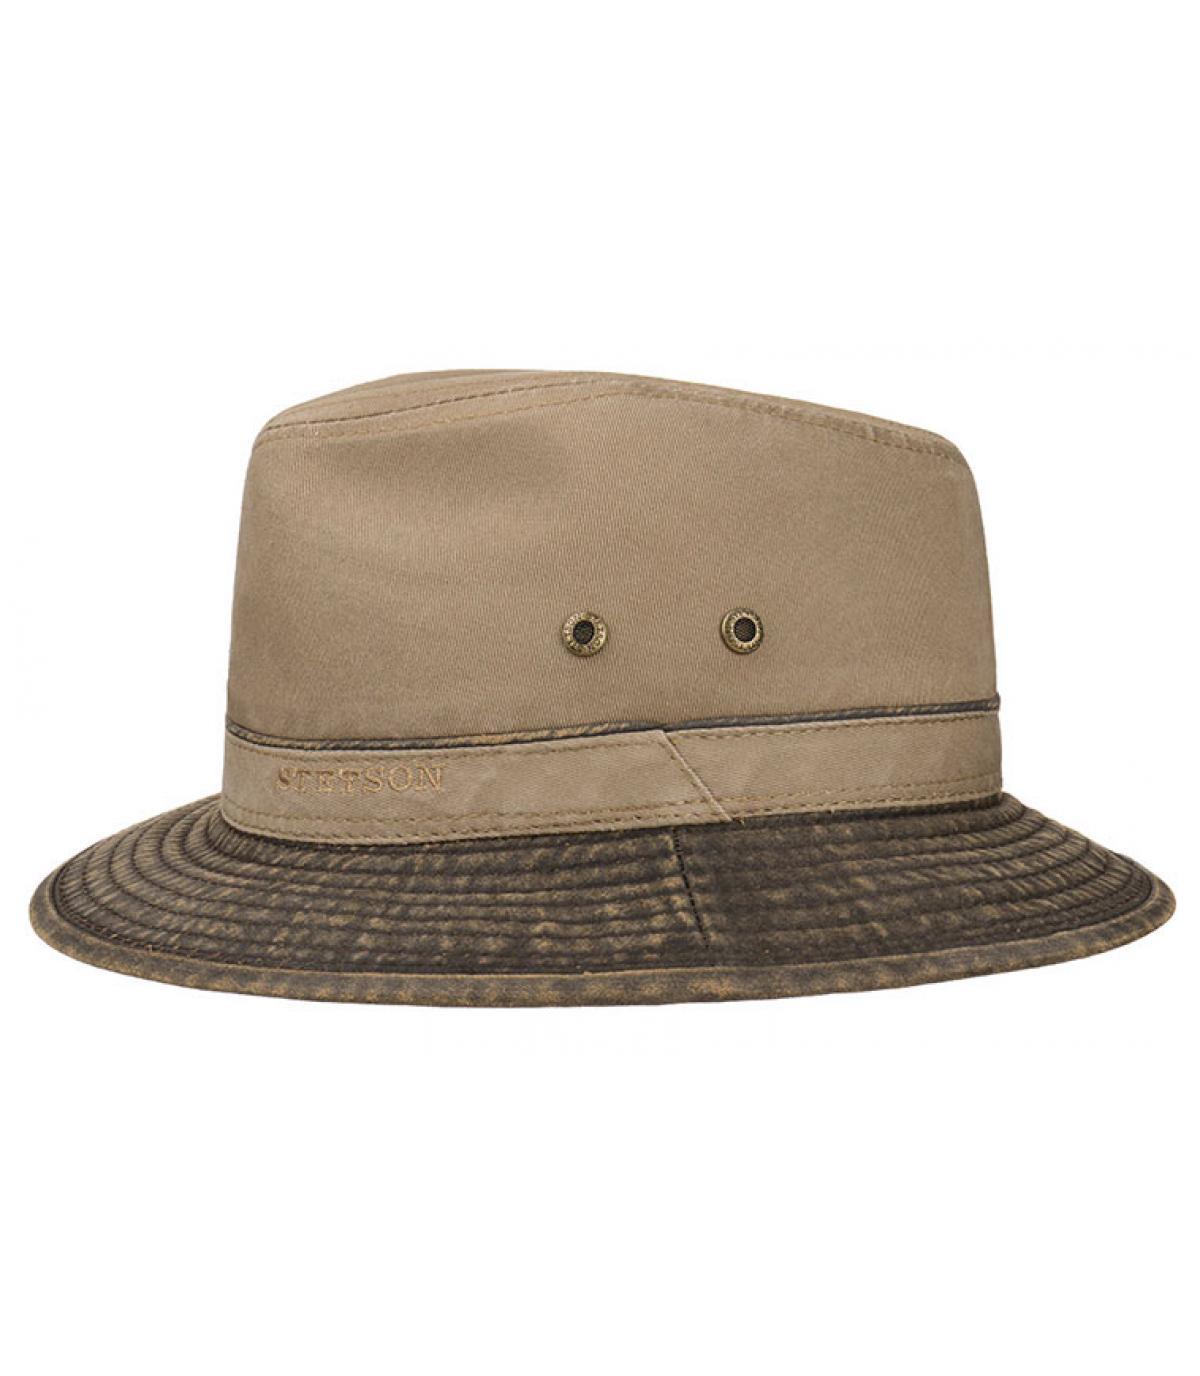 grey cotton travel hat